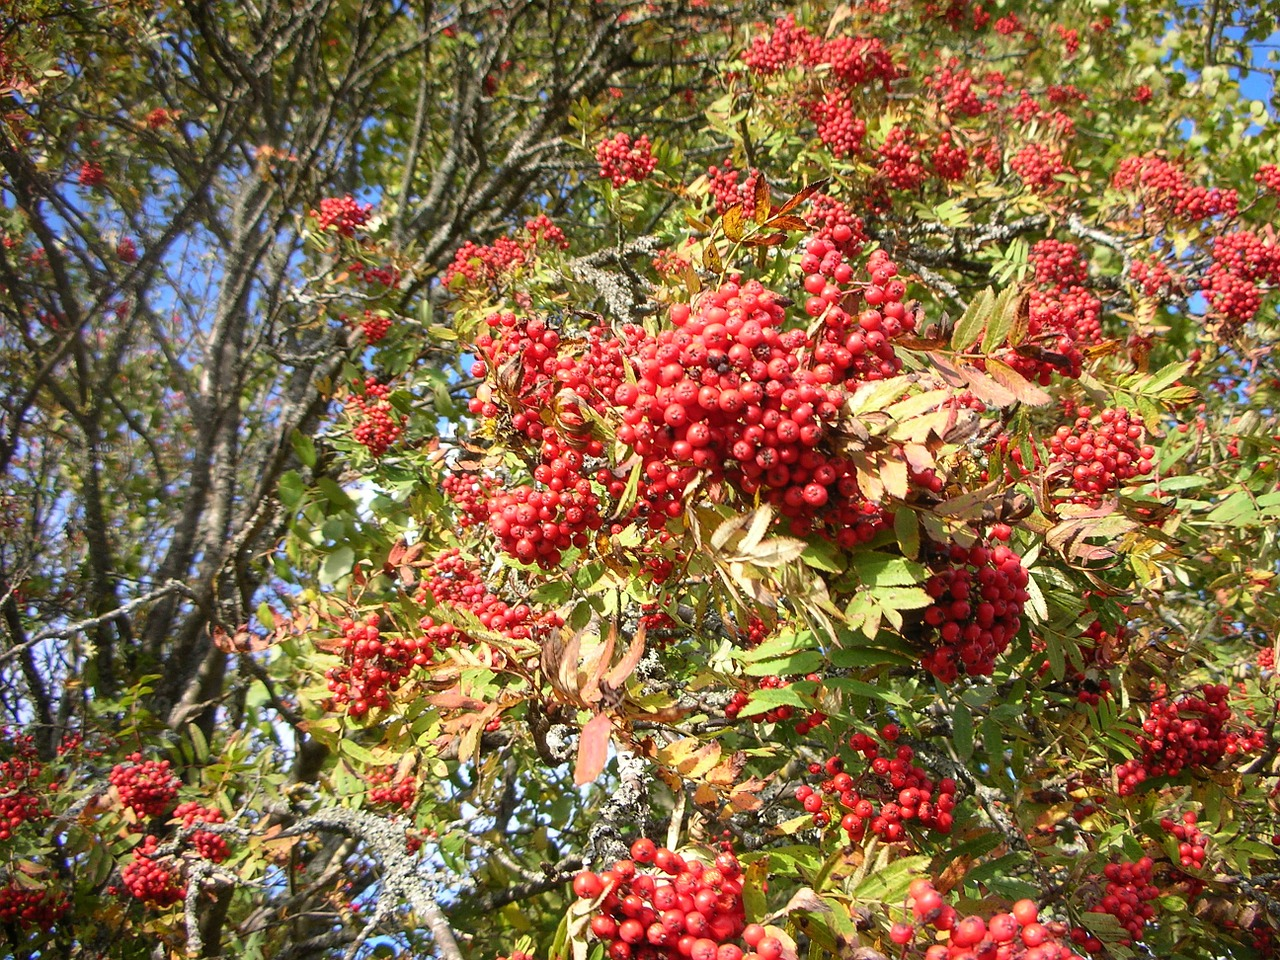 Rowan Tree Red Berries Branches Autumn Free Image From Needpix Com